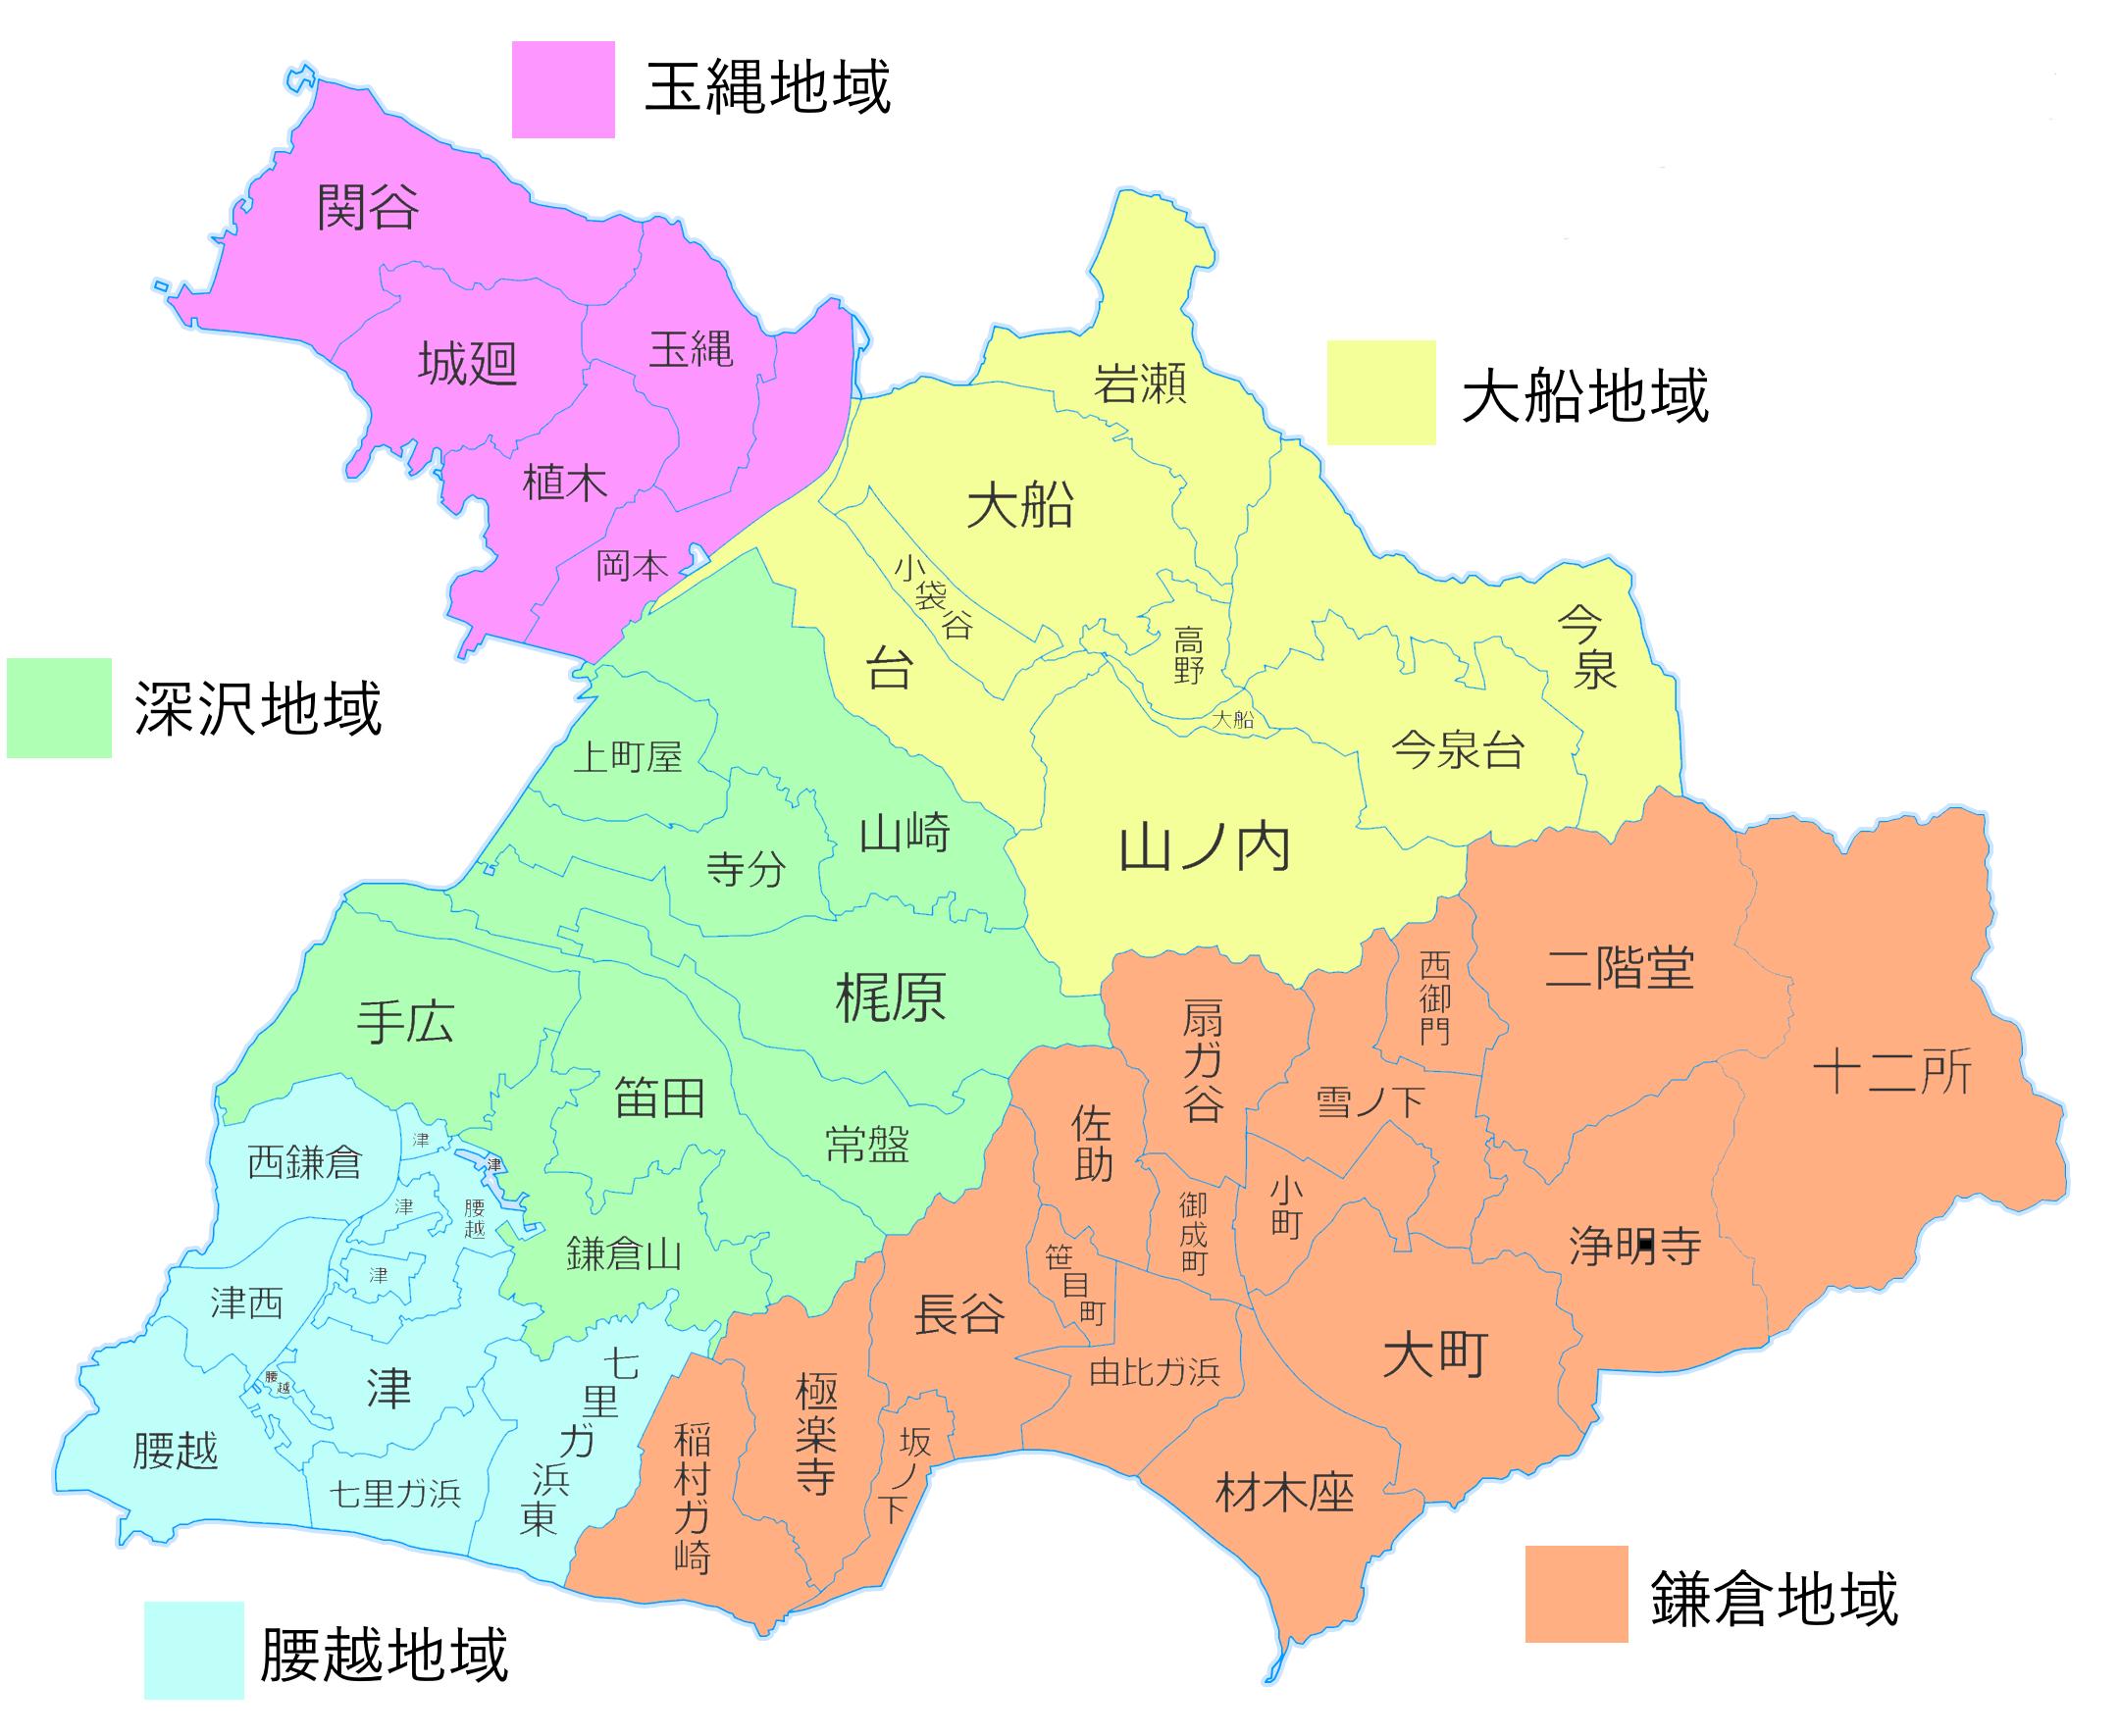 鎌倉の地域別人口と高齢化